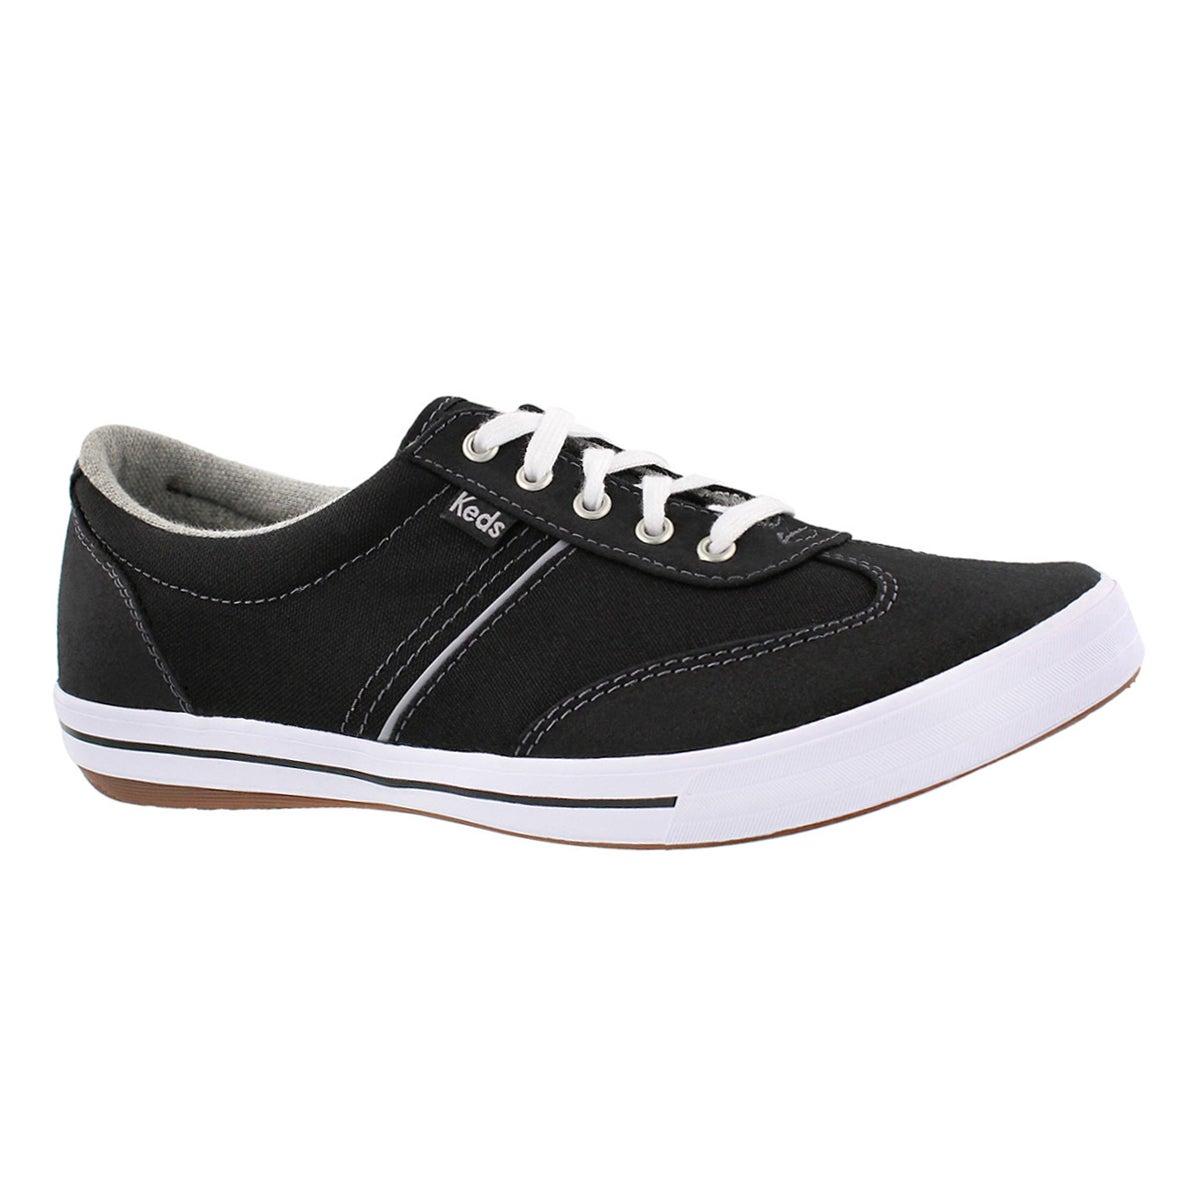 4263ad701f61 Keds-Women-039-s-Craze-II-Fashion-Sneaker thumbnail